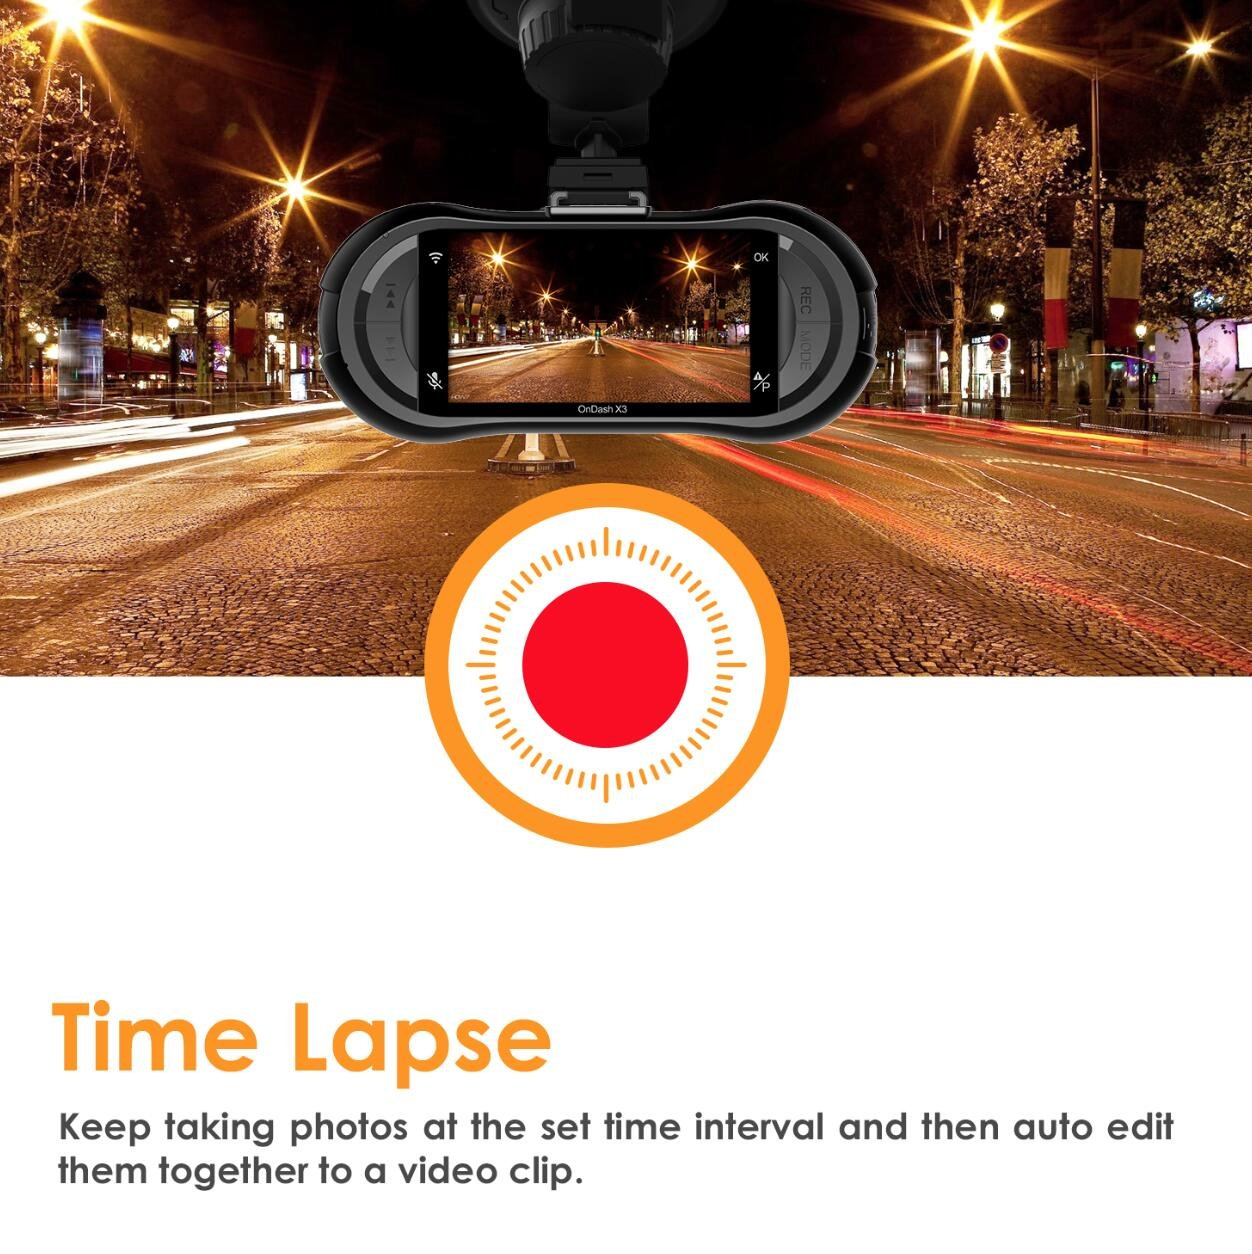 Vantrue X3 WIFI Dash Cam, Super HD 2.5K Car Dashboard Camera 1440P Car Camera with Ambarella A12 Chipset, 170°Wide Angle, Super HDR Night Vision, Loop Recording, Parking Mode, Motion Detection by VANTRUE (Image #5)